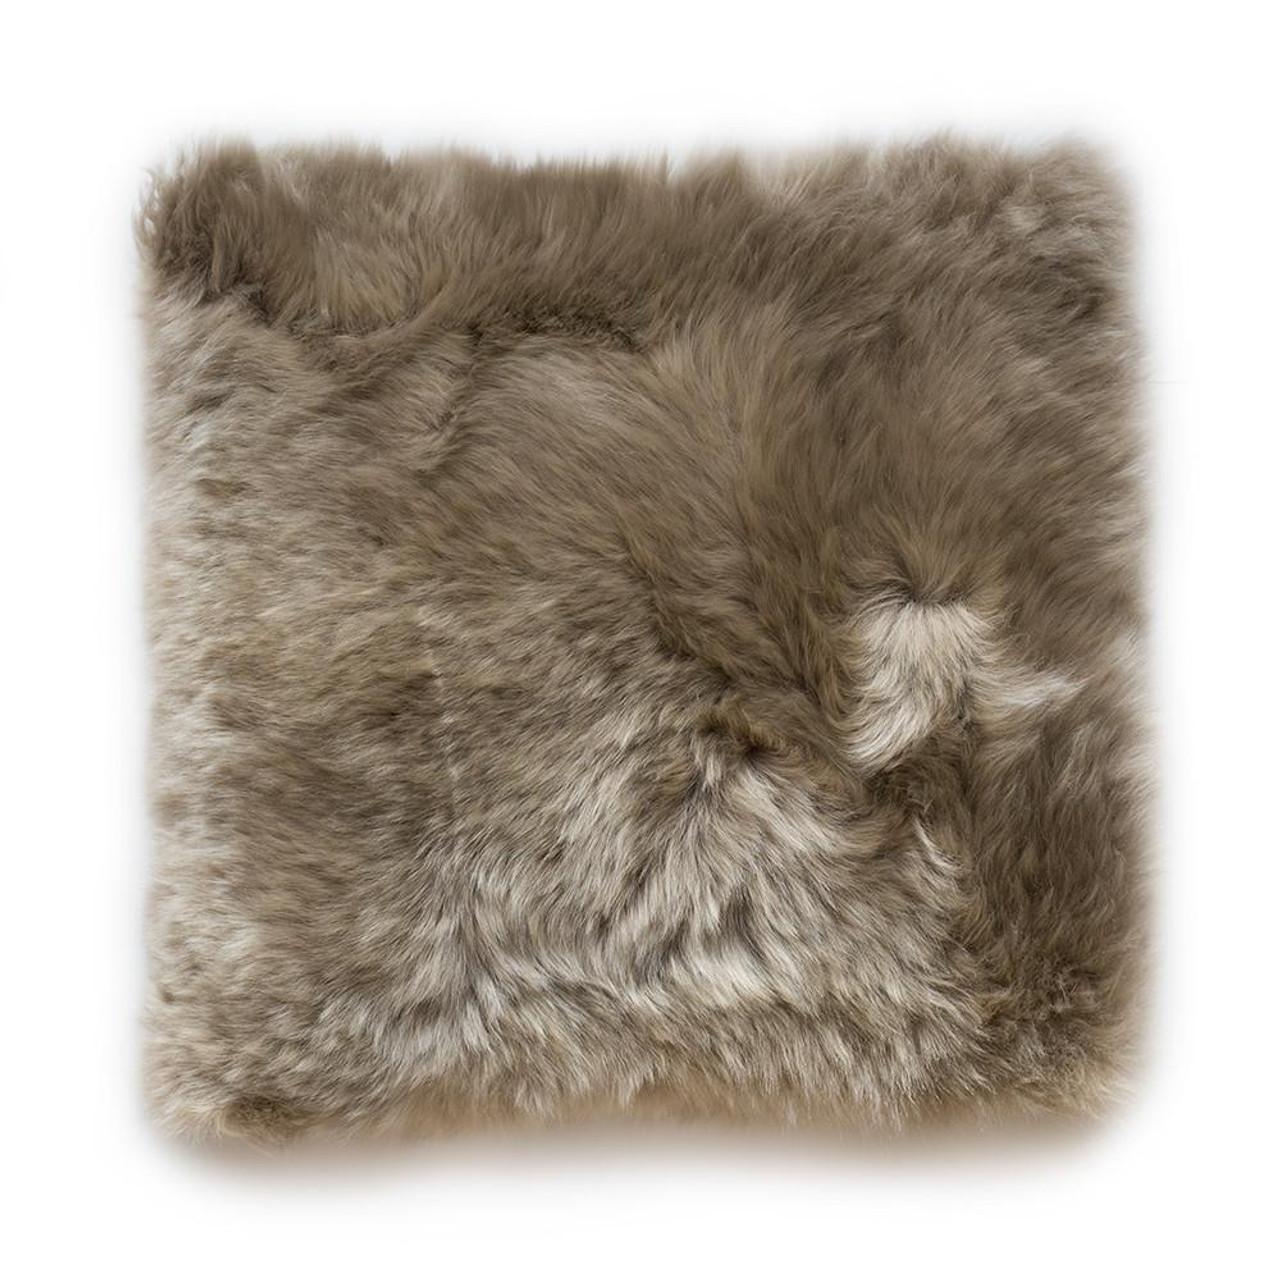 Sheepskin Cushion Cover - Option 2